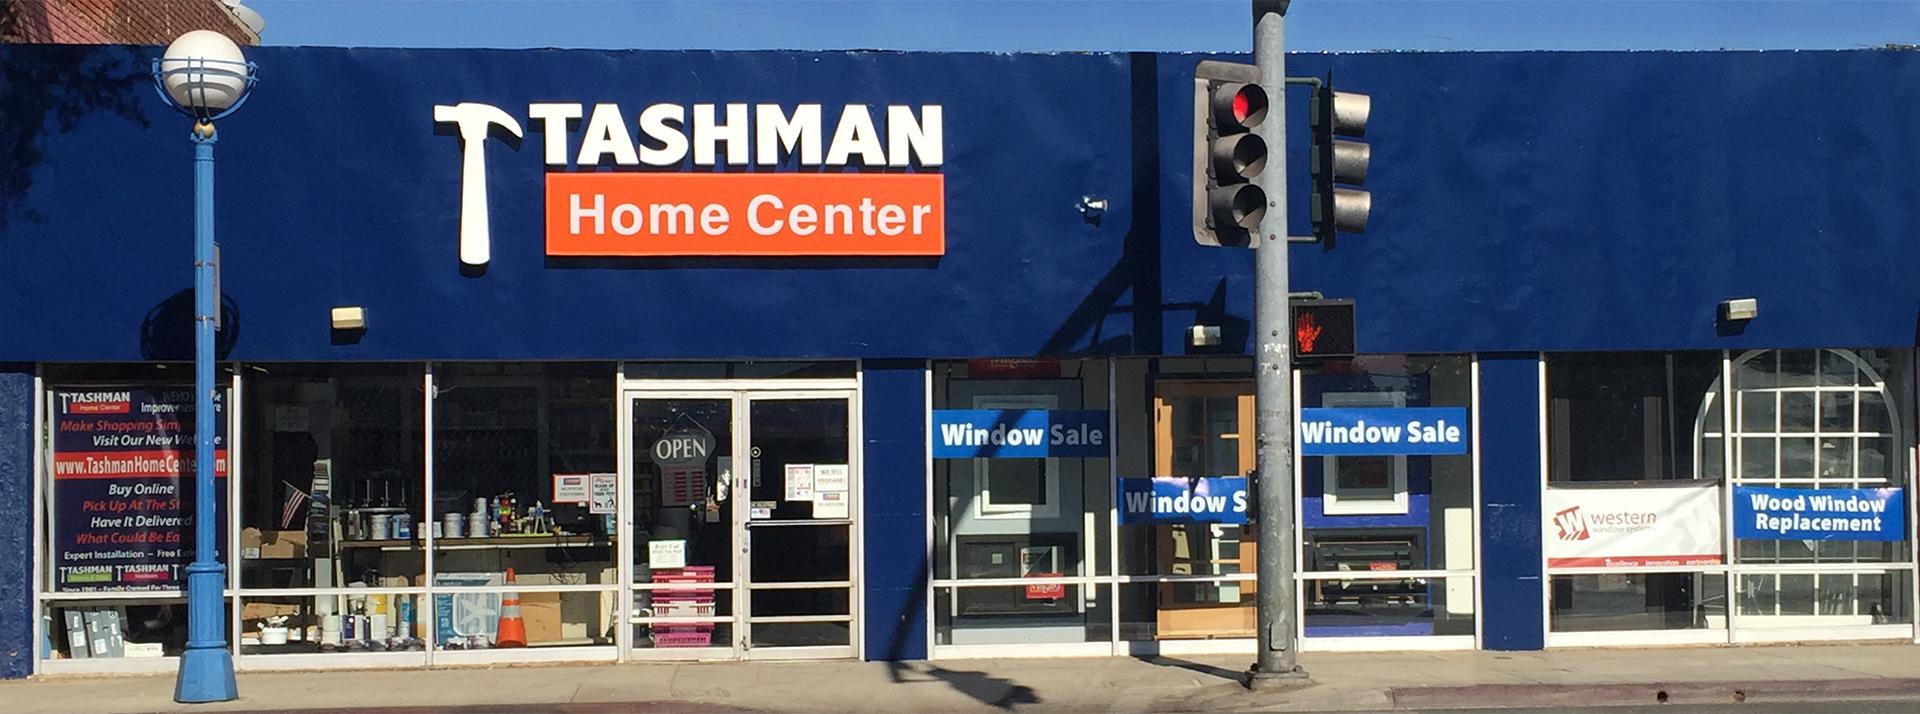 Tashman Home Center Los Angeles